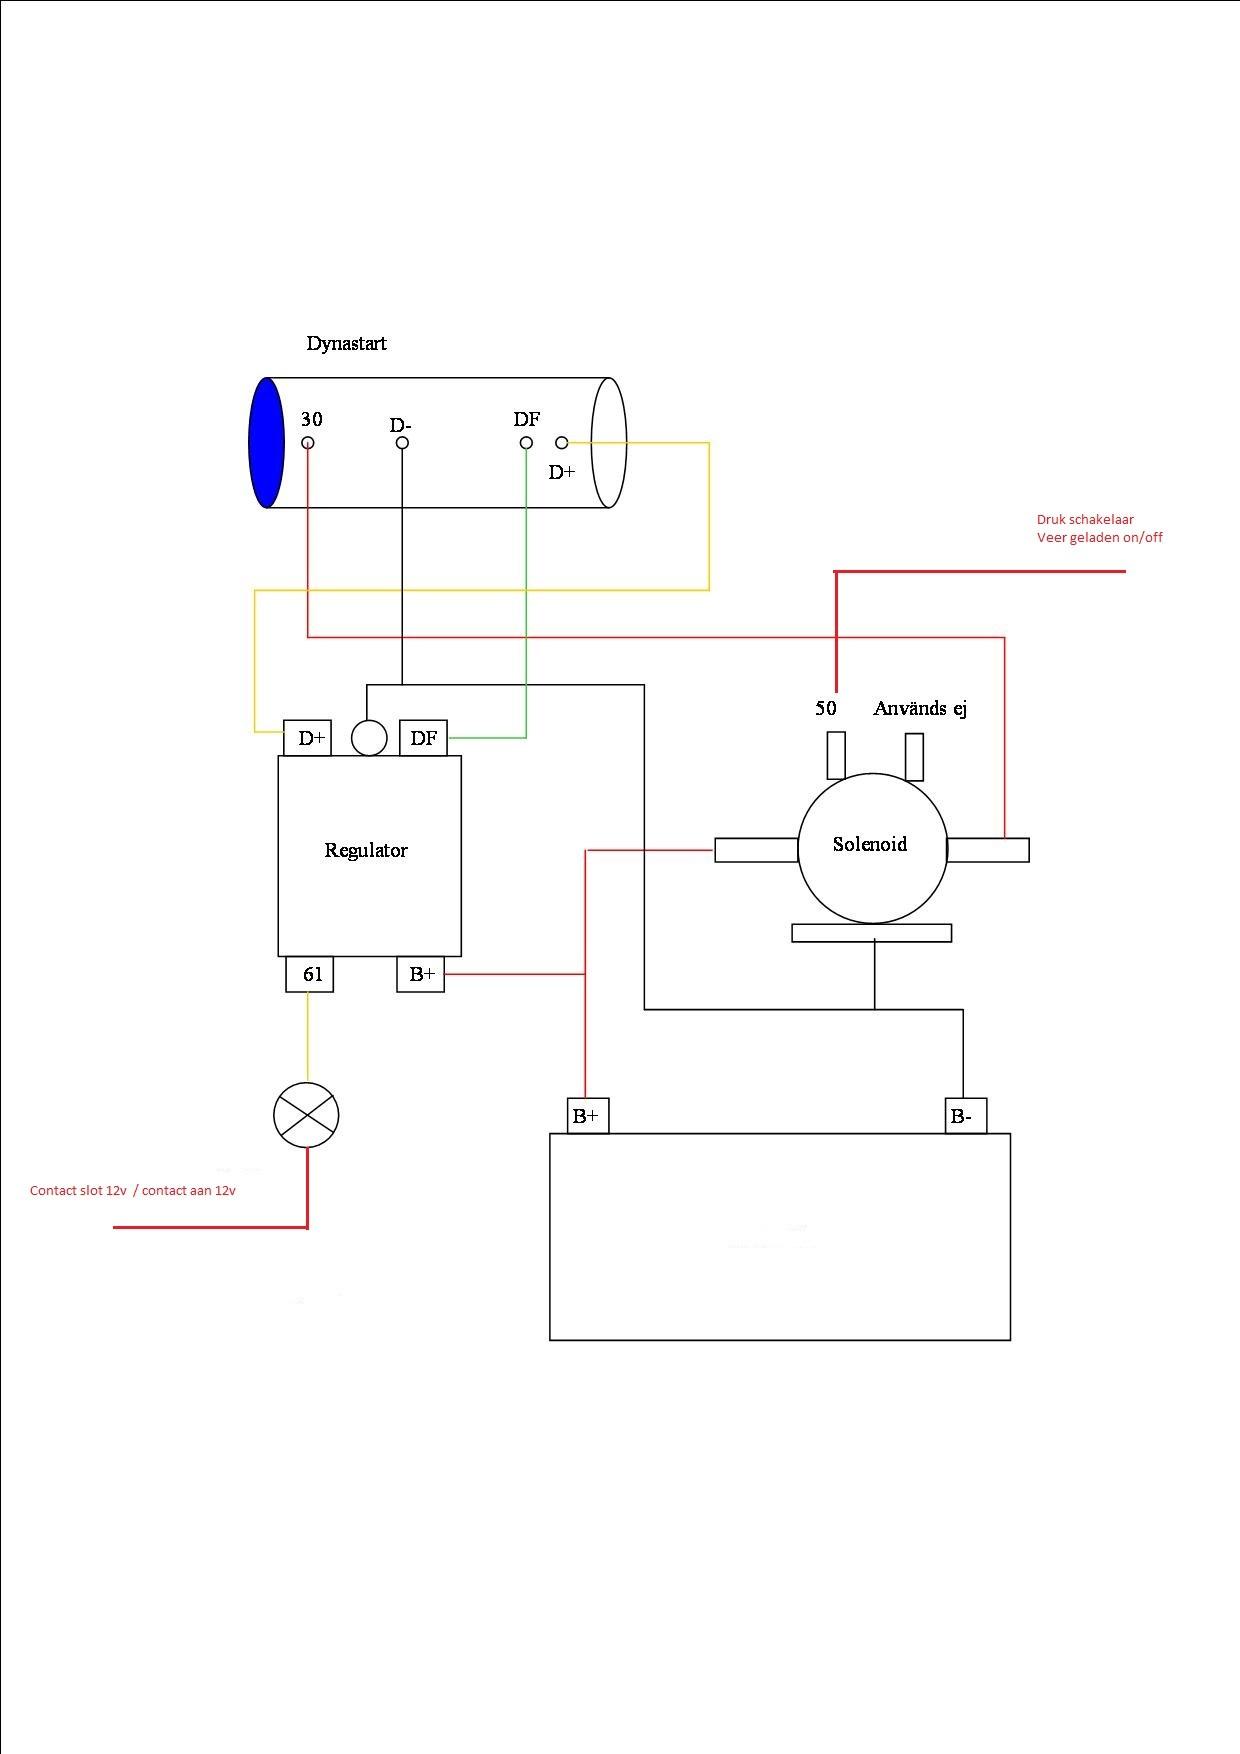 lucas dynastart wiring diagram cisco unified communications architecture volvo penta manual e books complete set met regelaar en startrelais md1complete